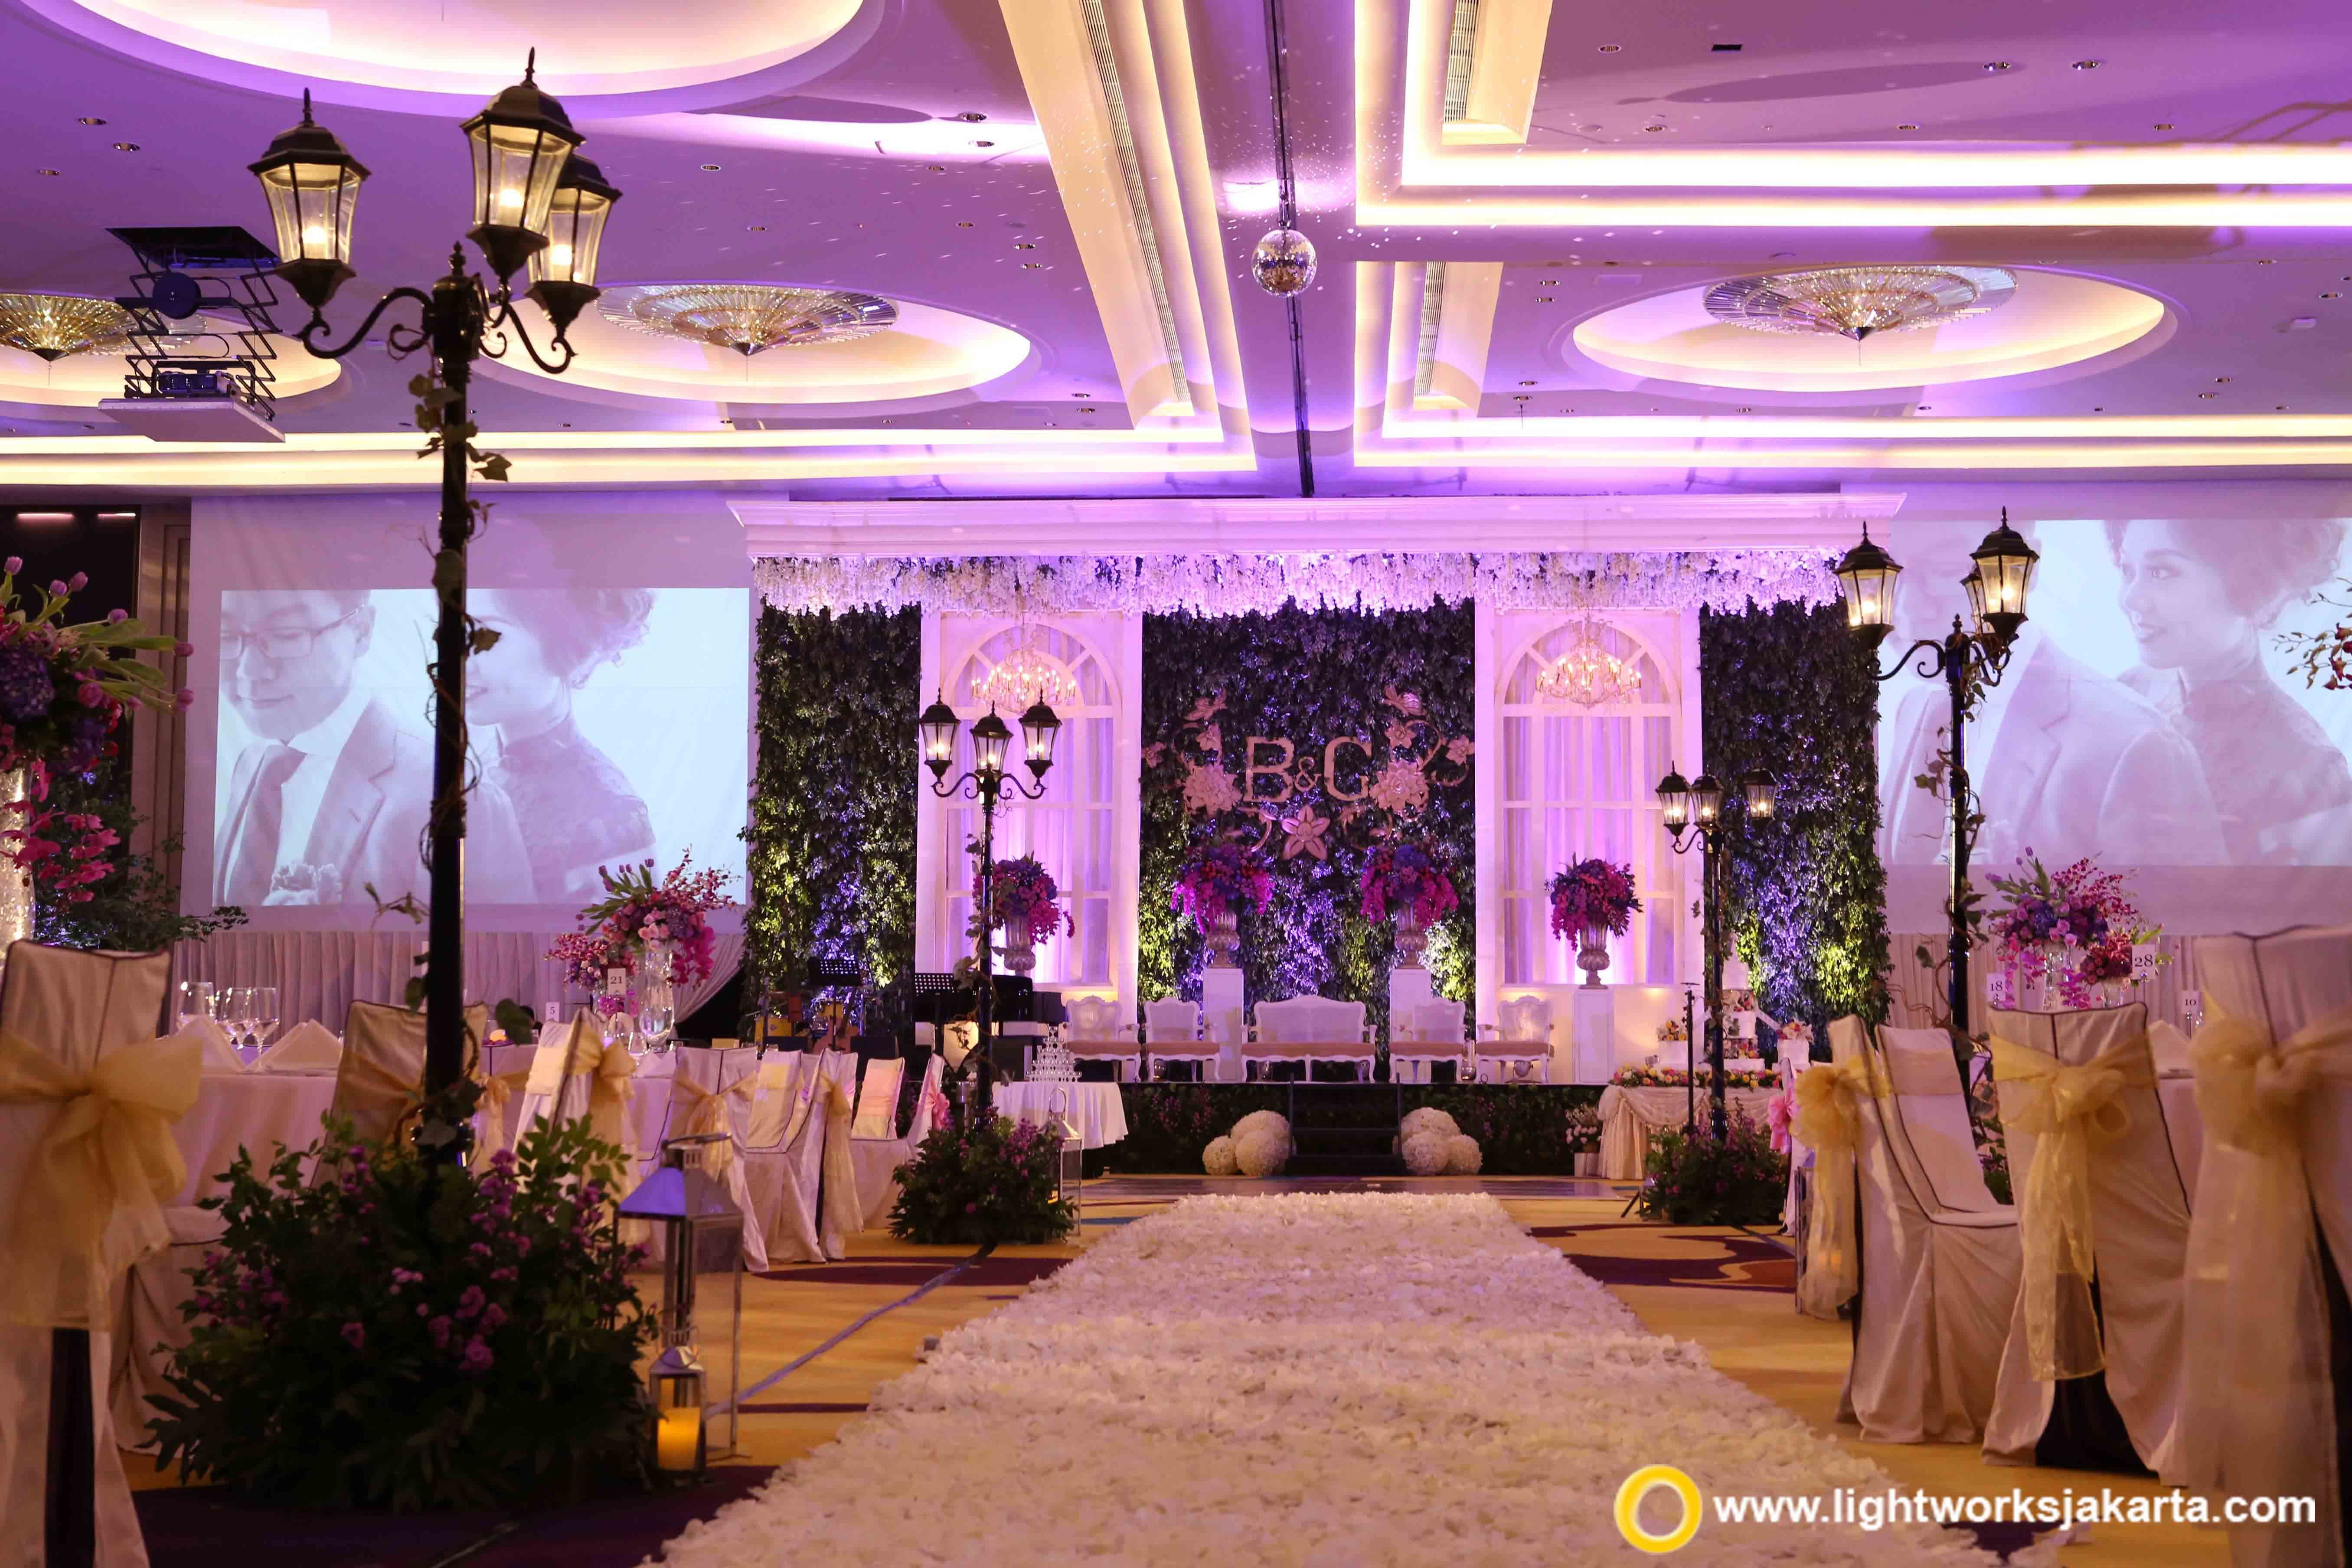 The purple wedding foyer by grasida decoration and lightworks at the purple wedding foyer by grasida decoration and lightworks at manggala wanabakti lightworksjakarta wedding decoration and lighting junglespirit Images